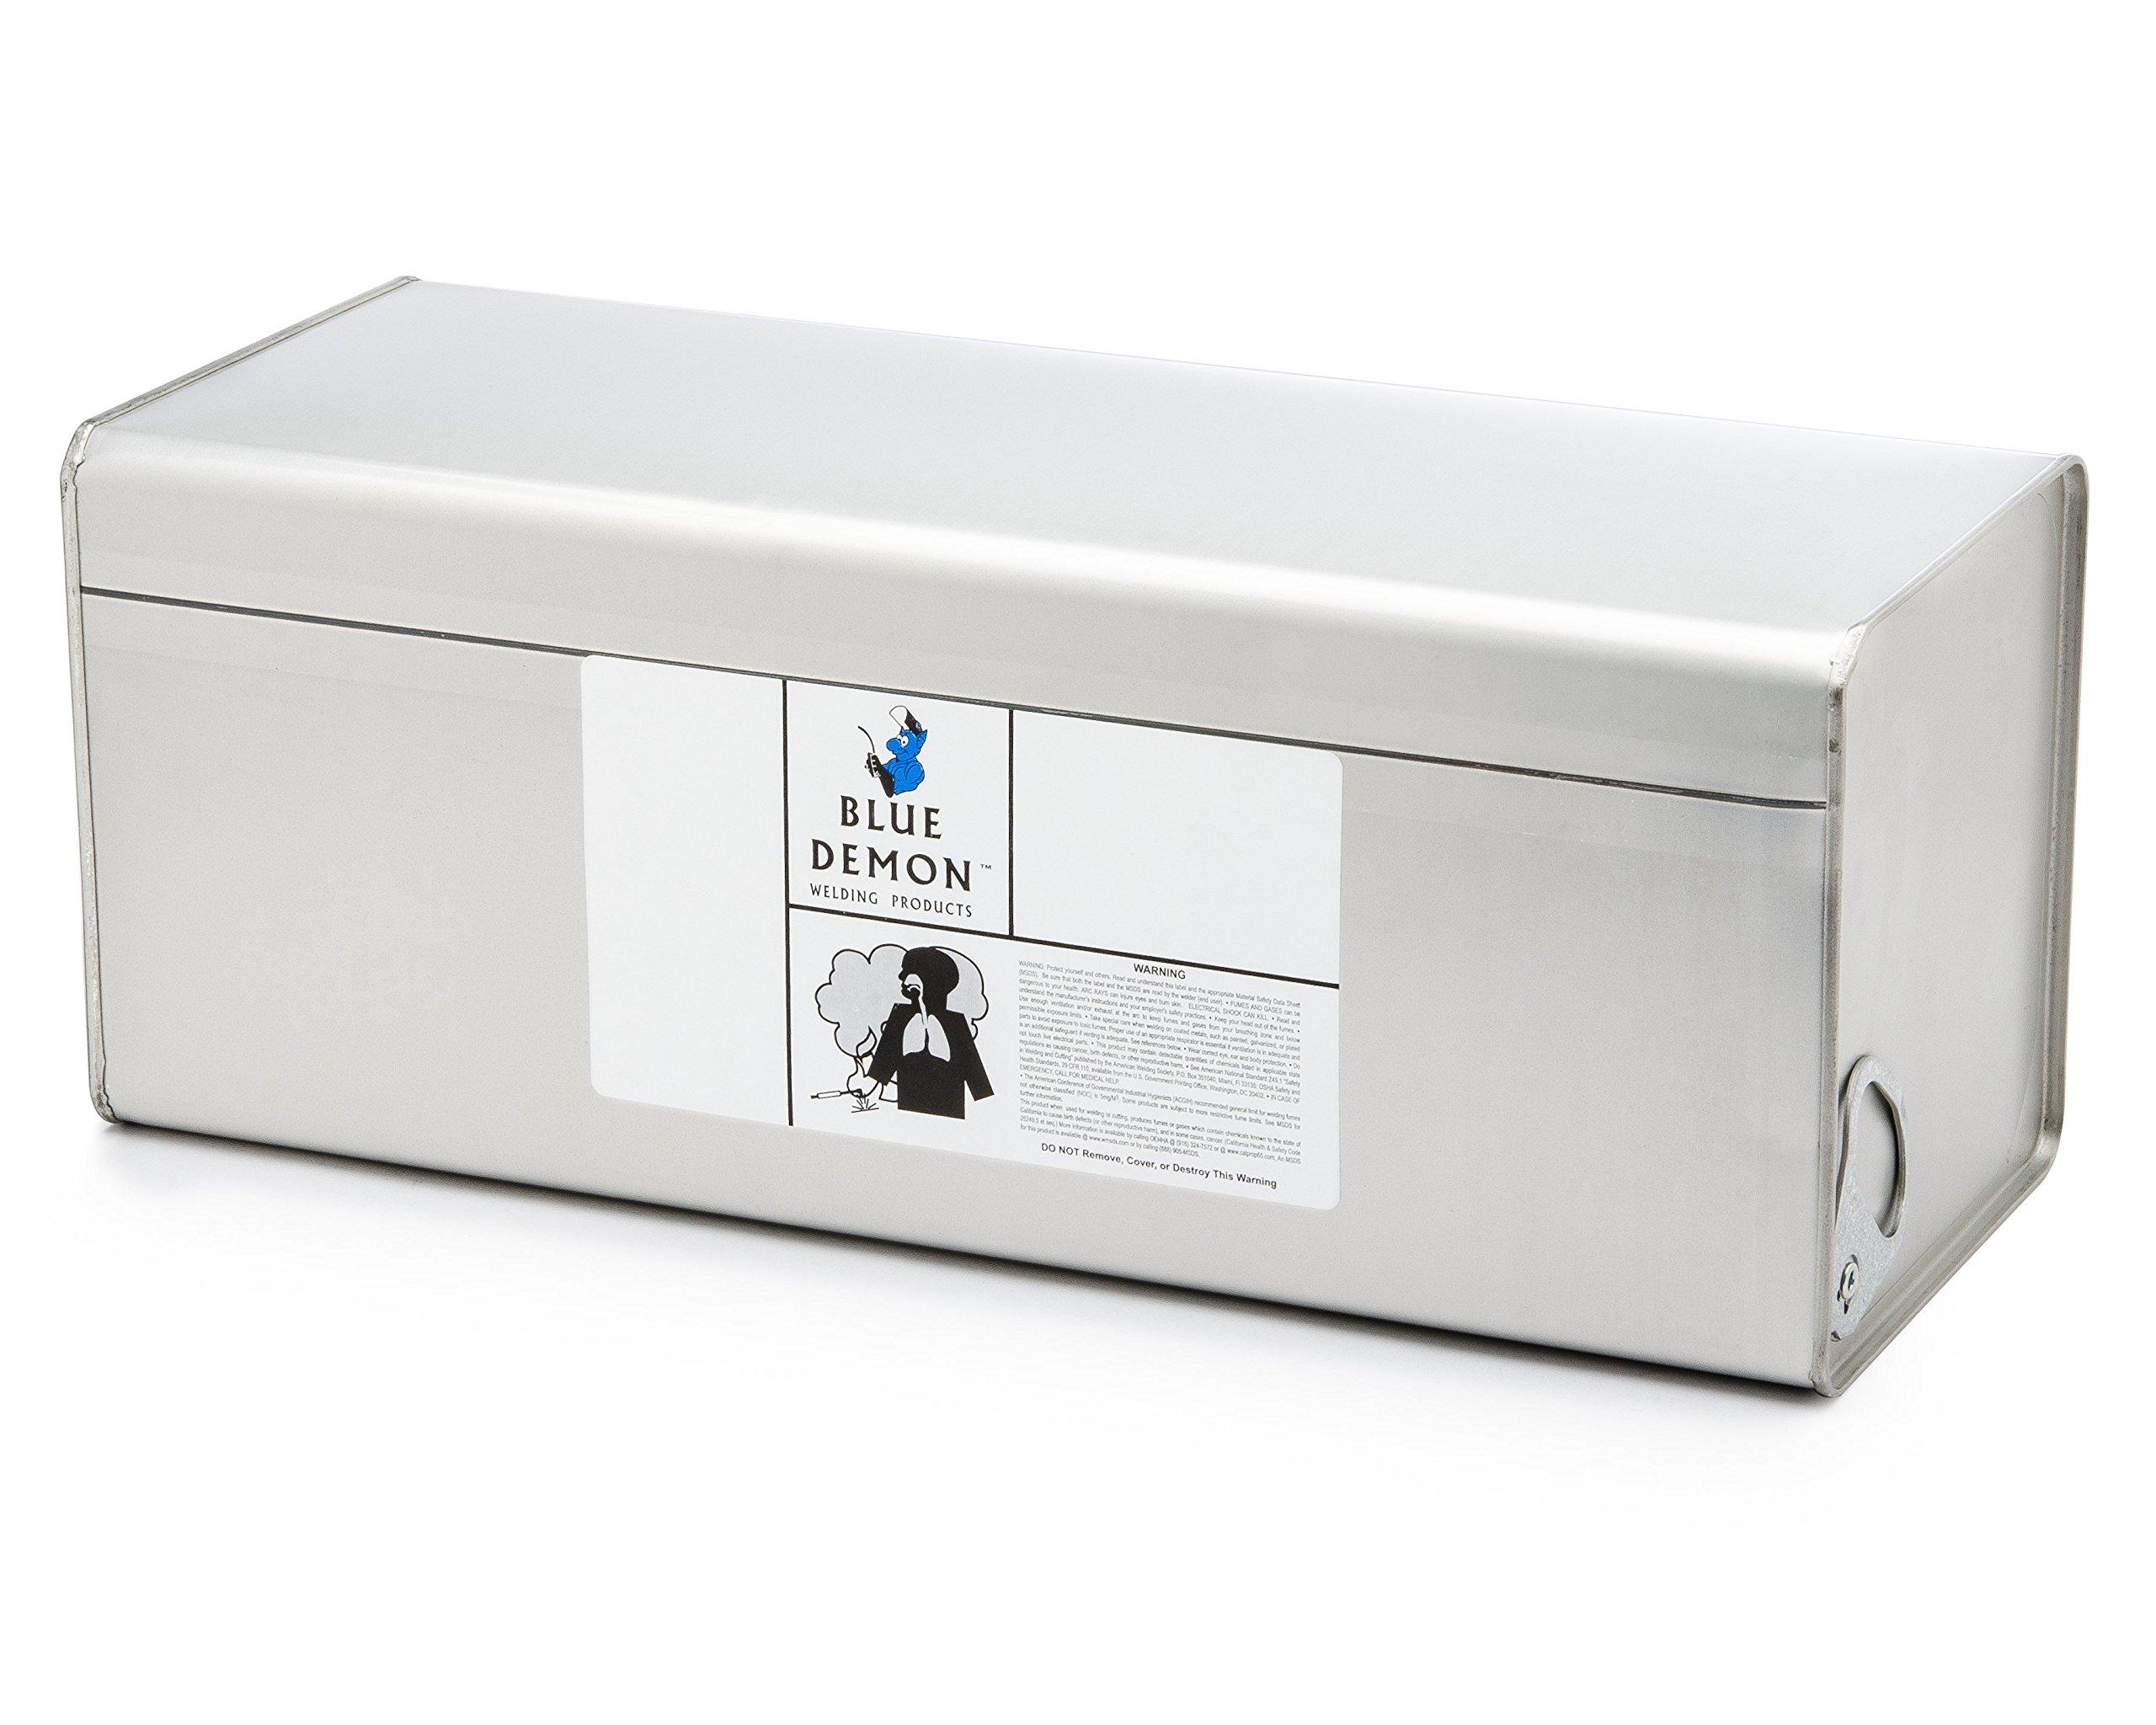 Blue Demon 7018 X 3/16'' X 14'' X 50# Can Low Hydrogen Carbon Steel Electrode